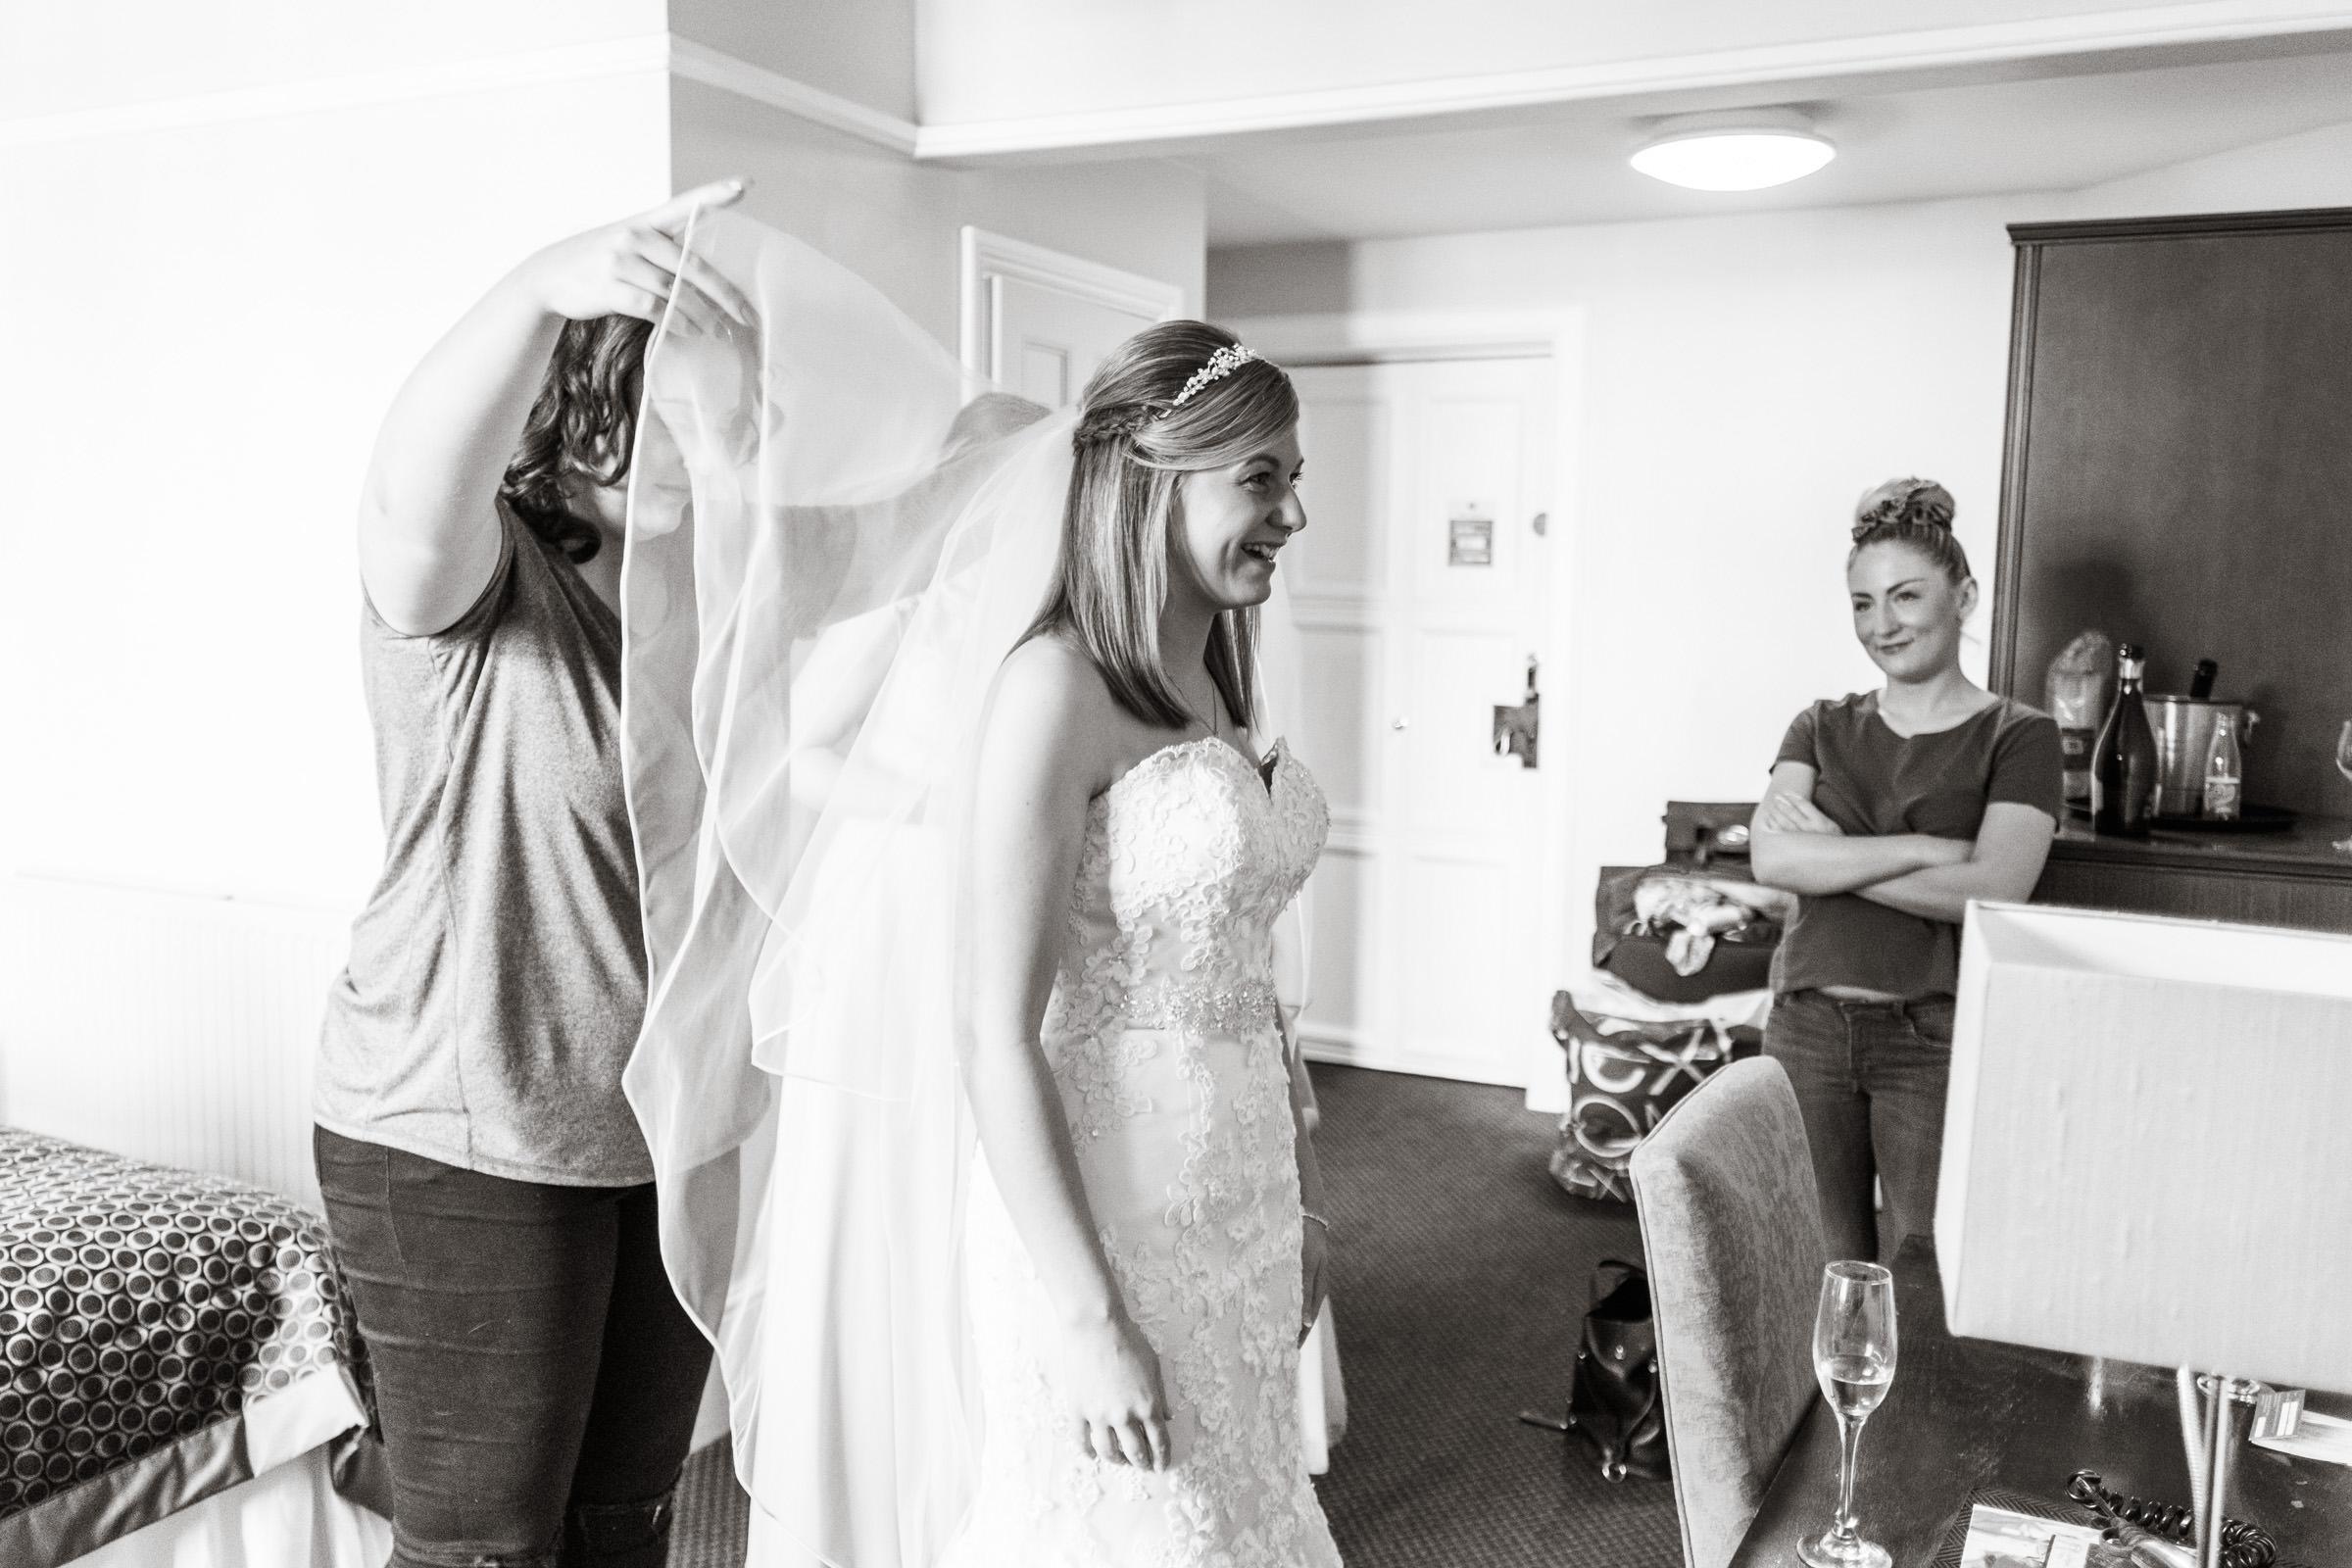 Donna & Nick's Wedding at Wotton House in Dorking 005.jpg